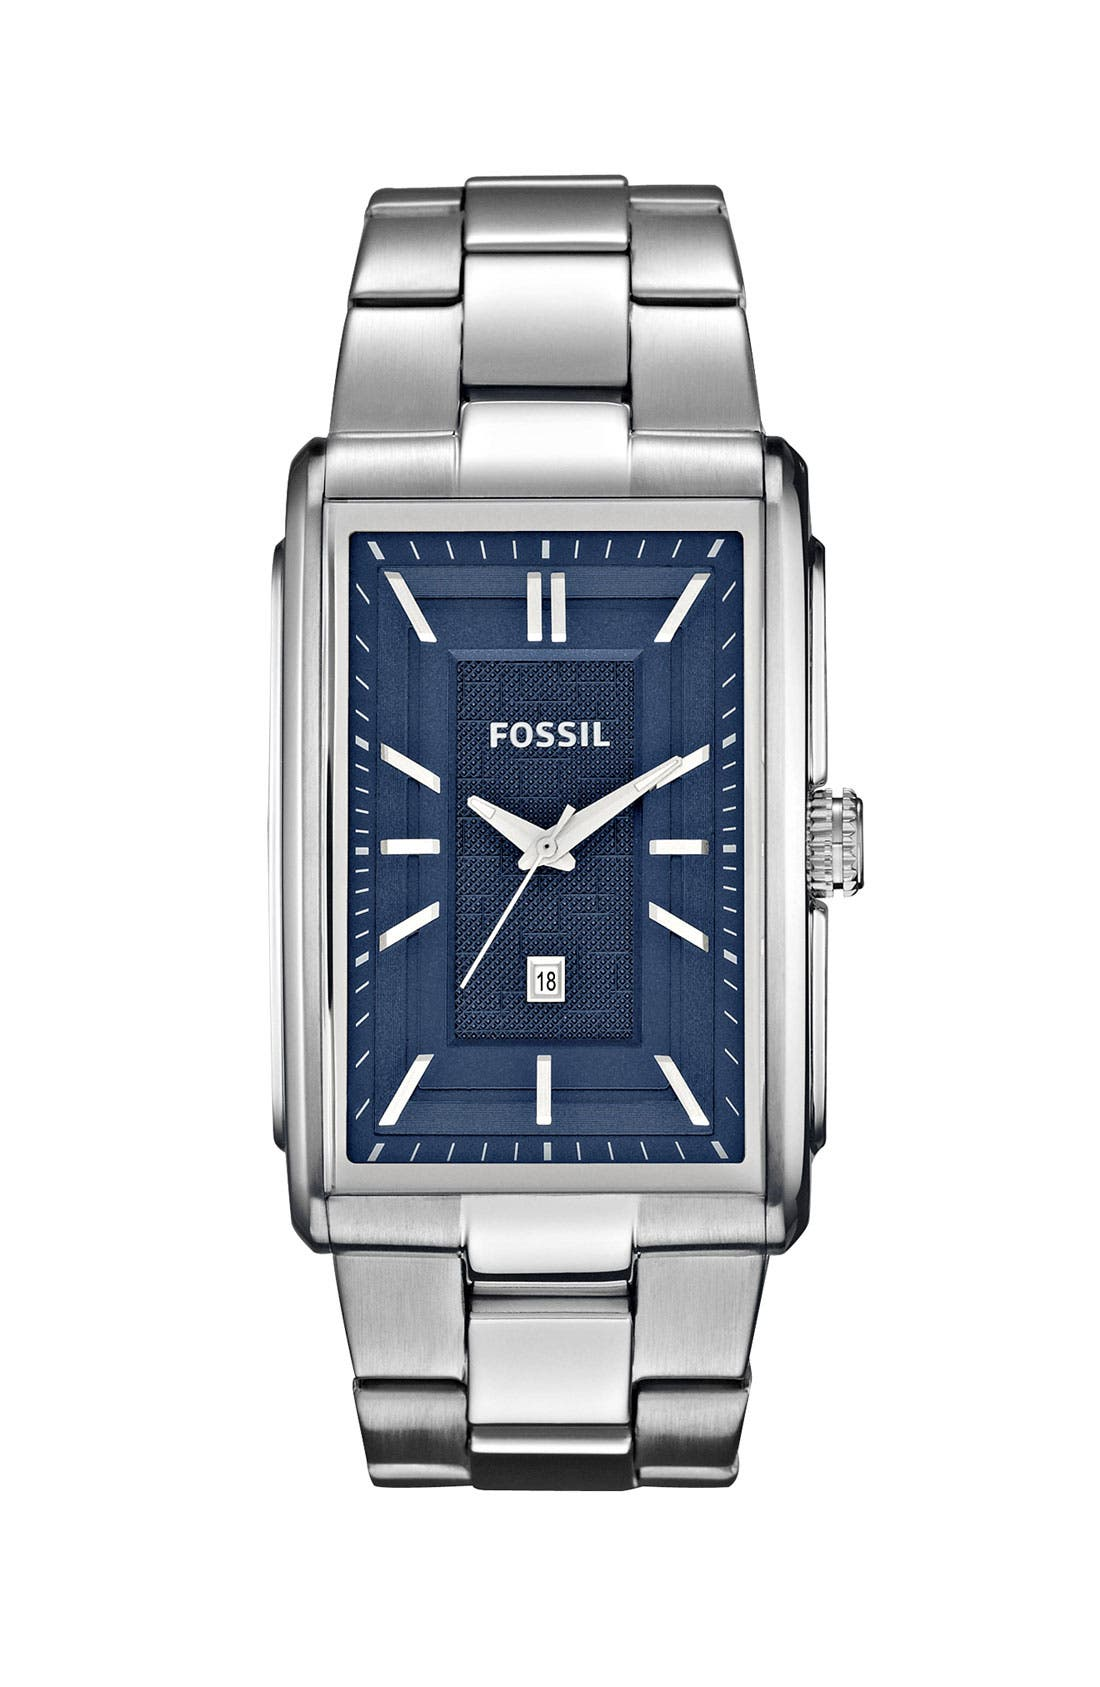 Main Image - Fossil 'Truman' Rectangular Bracelet Watch, 33mm x 49mm